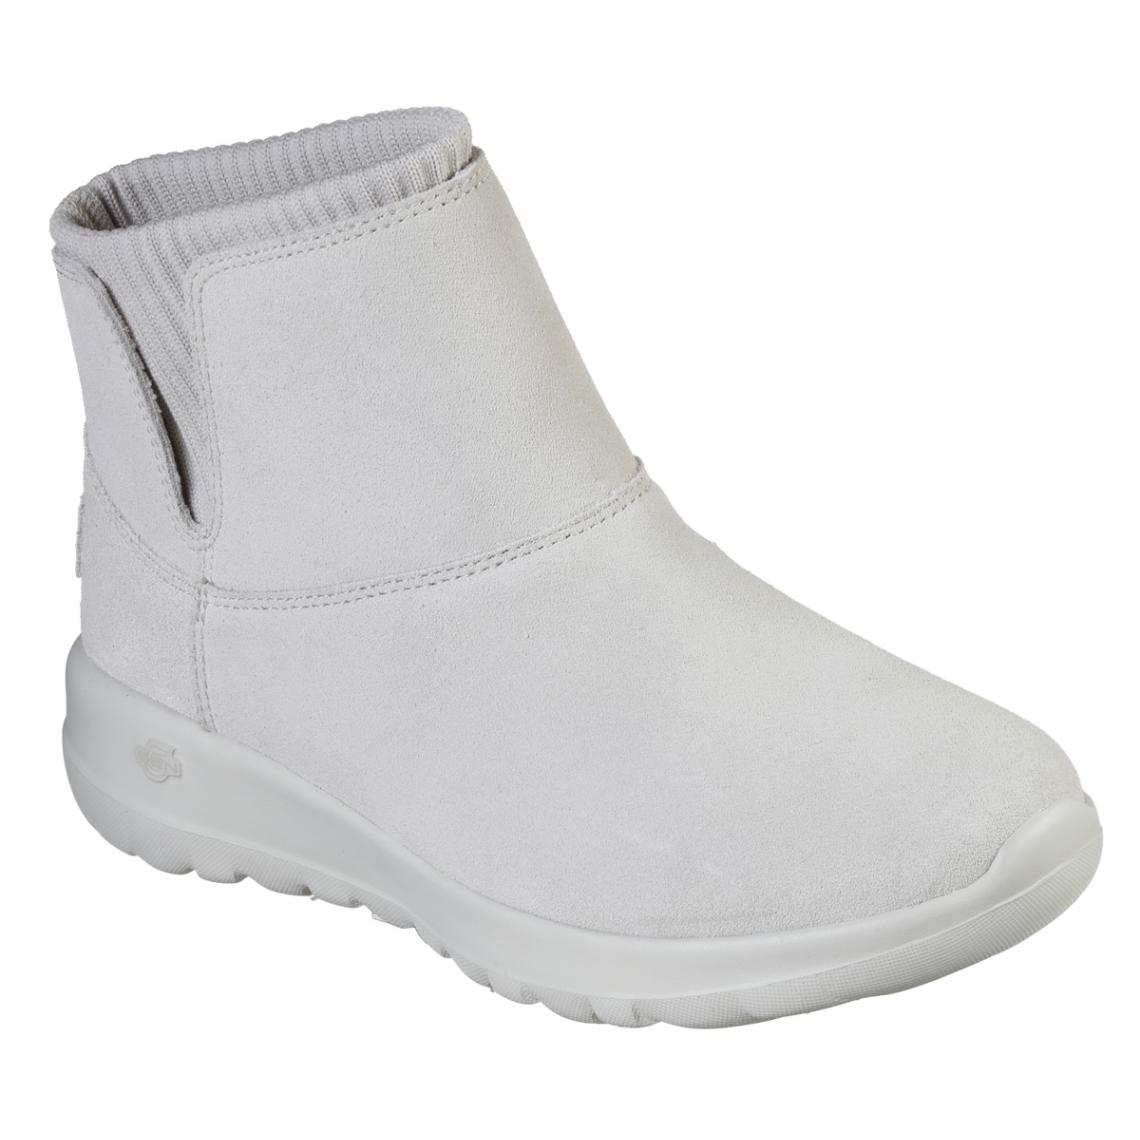 Promo : Boots Femme Naturel - Skechers - Modalova